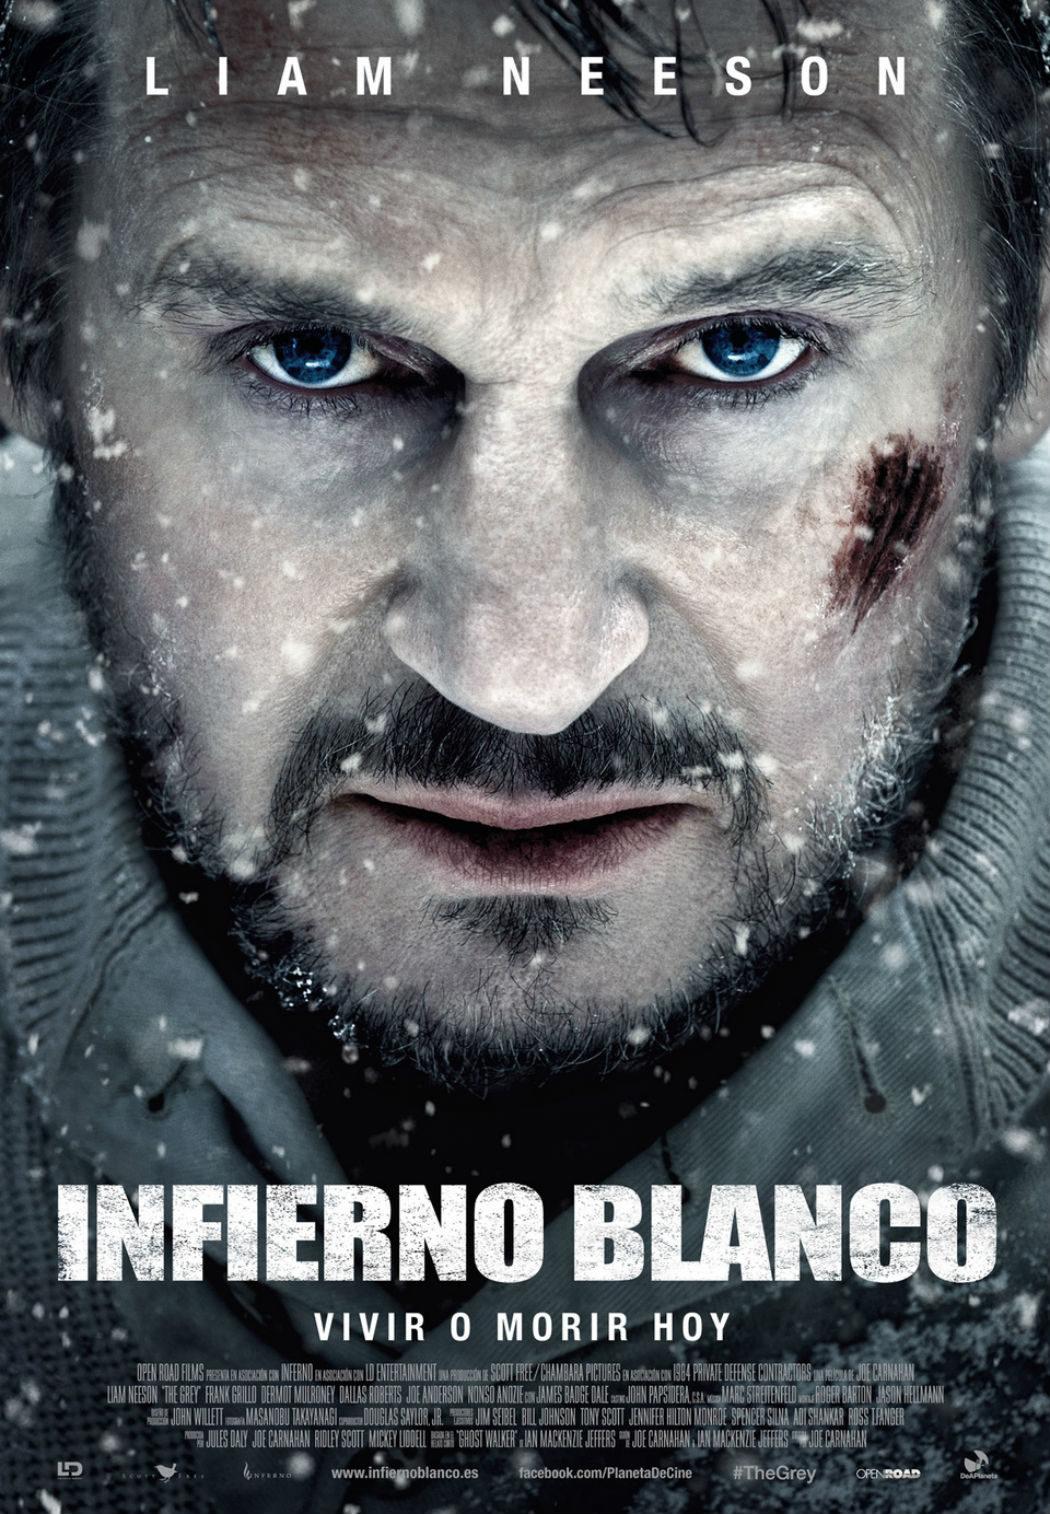 'Infierno blanco' (2011)